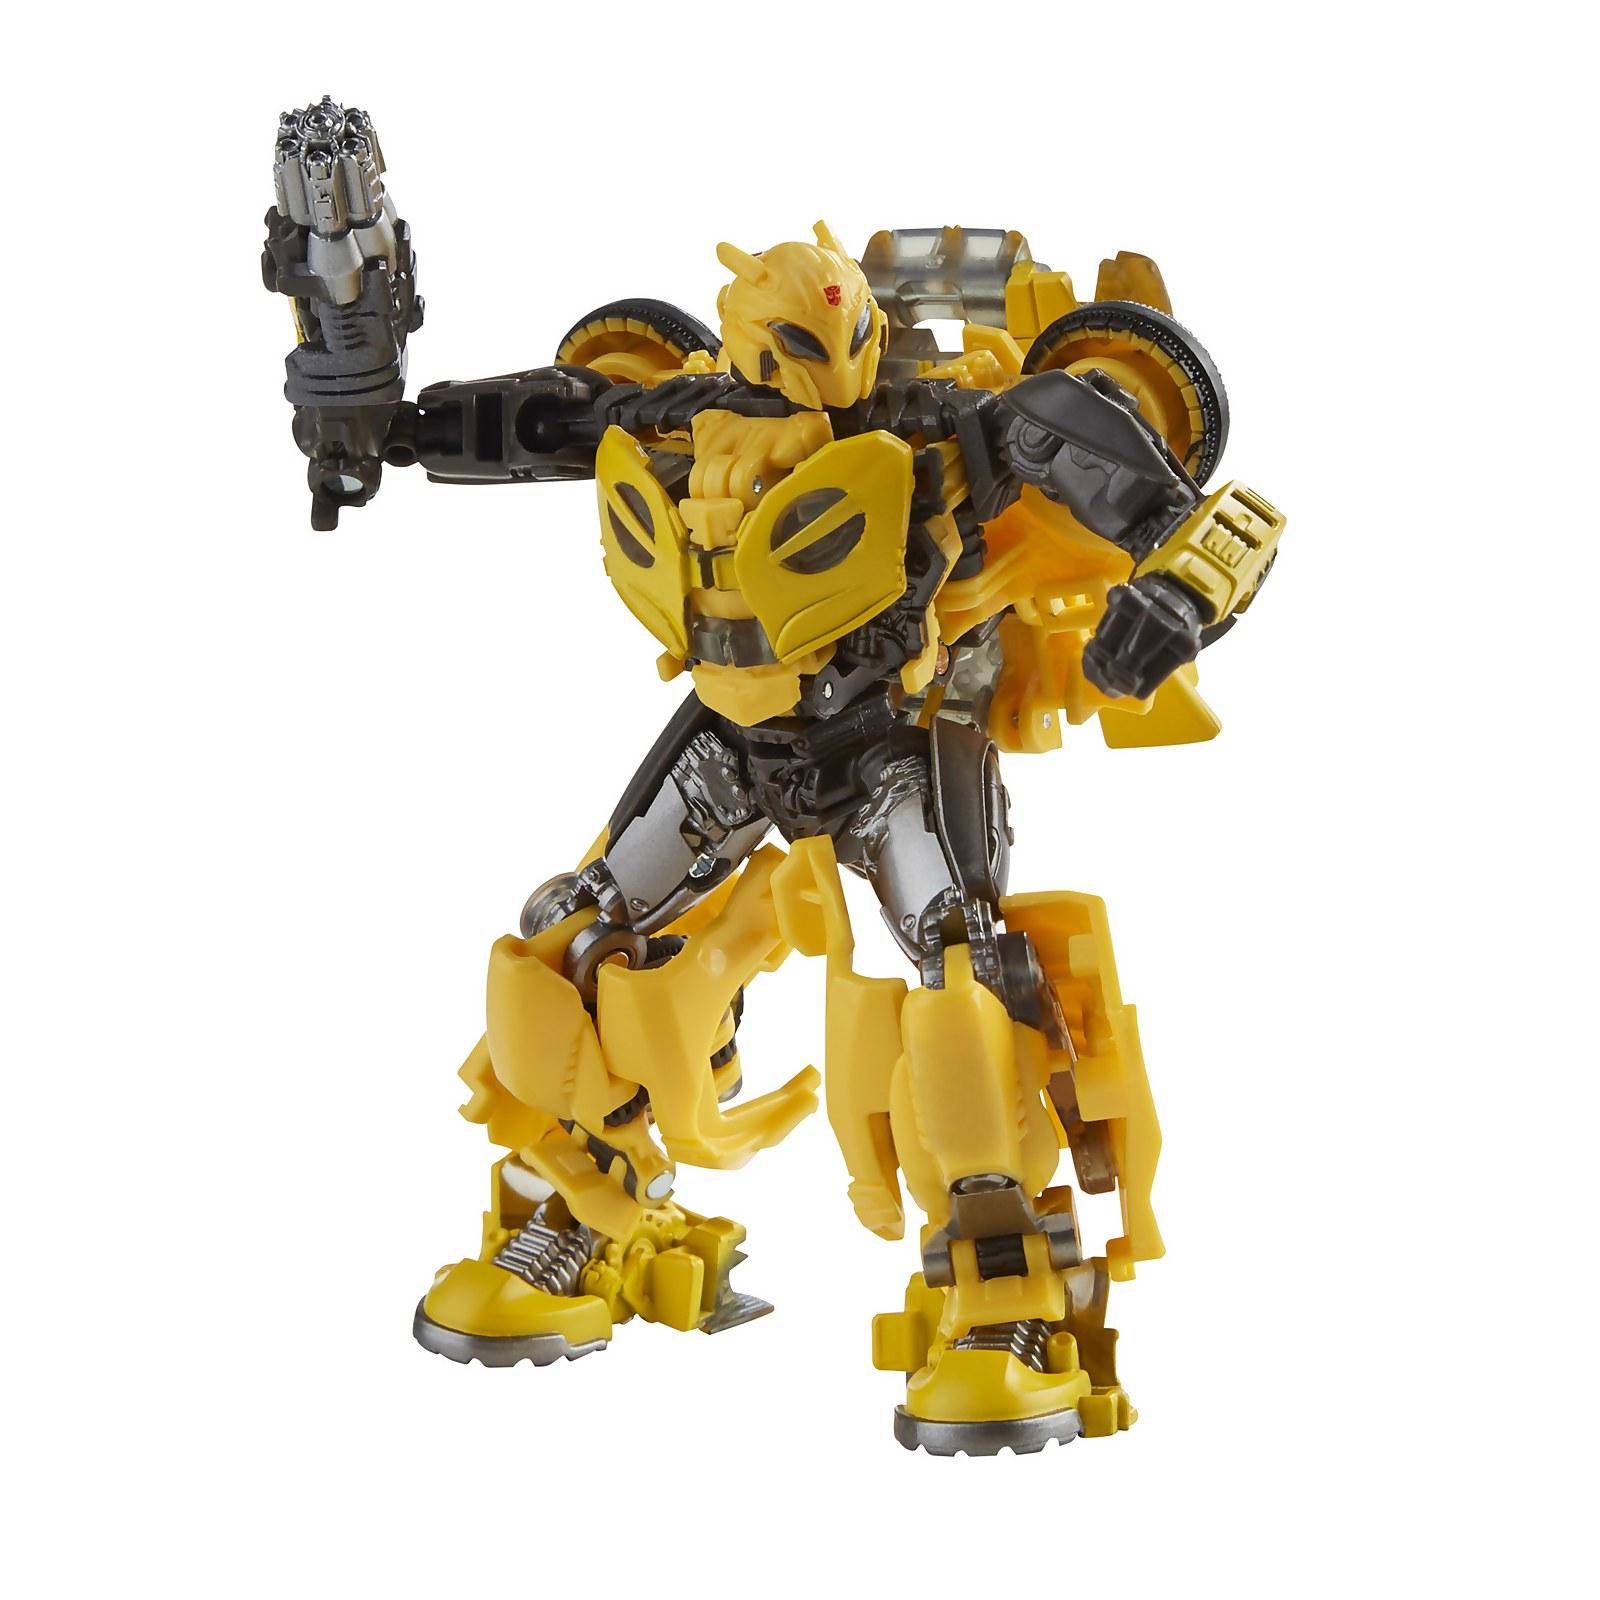 Hasbro Transformers Studio Series 70 Deluxe Transformers: Bumblebee B-127